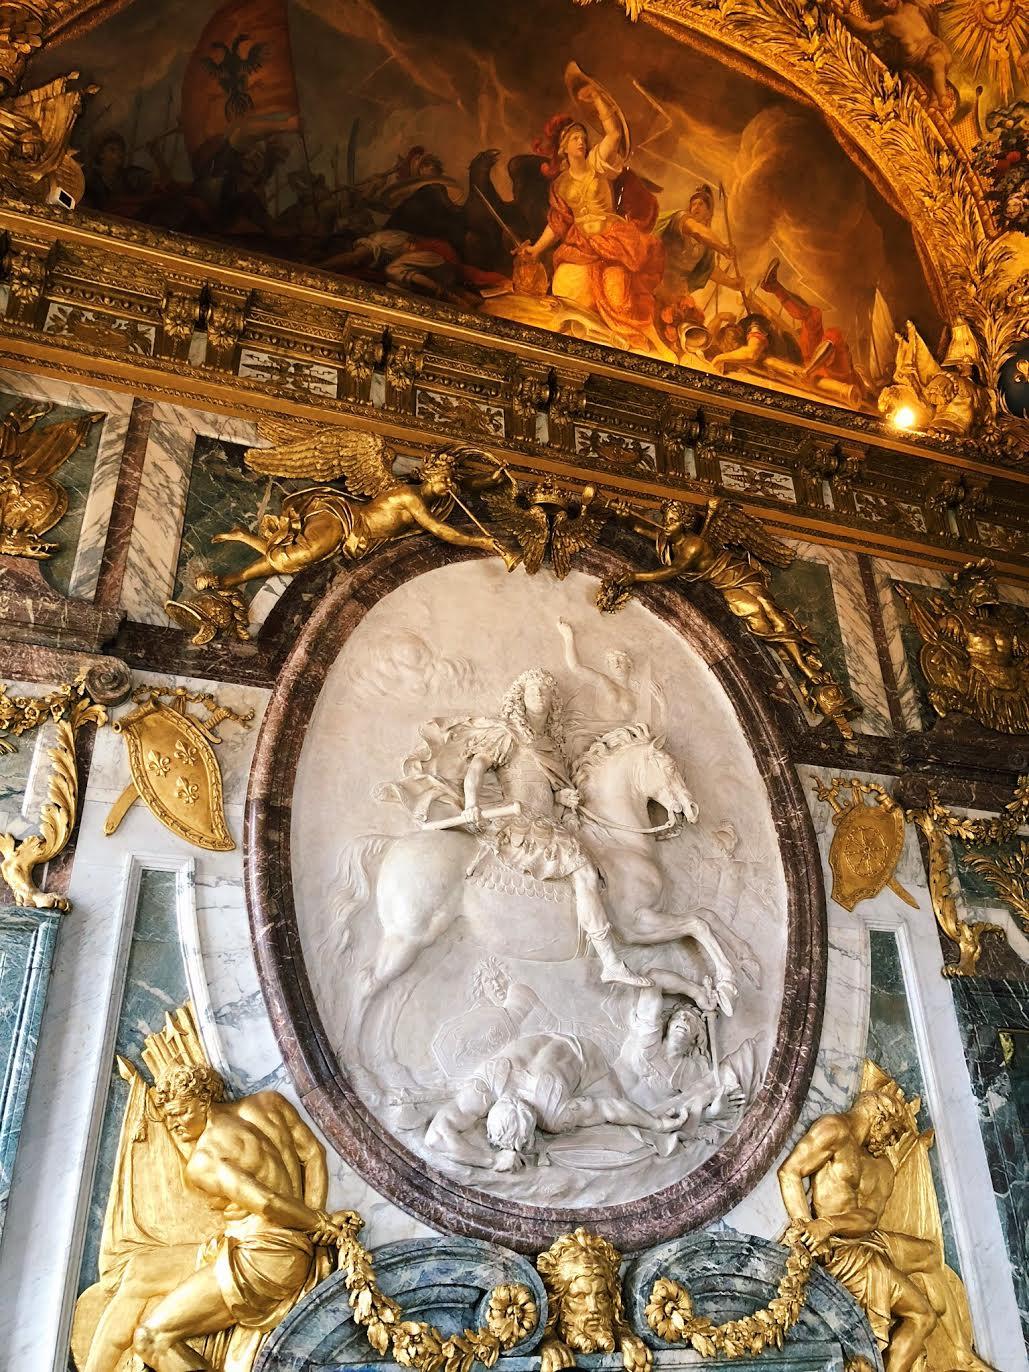 Muslim-travel-guide-Paris-Palace-of-Versailles-mural.jpg